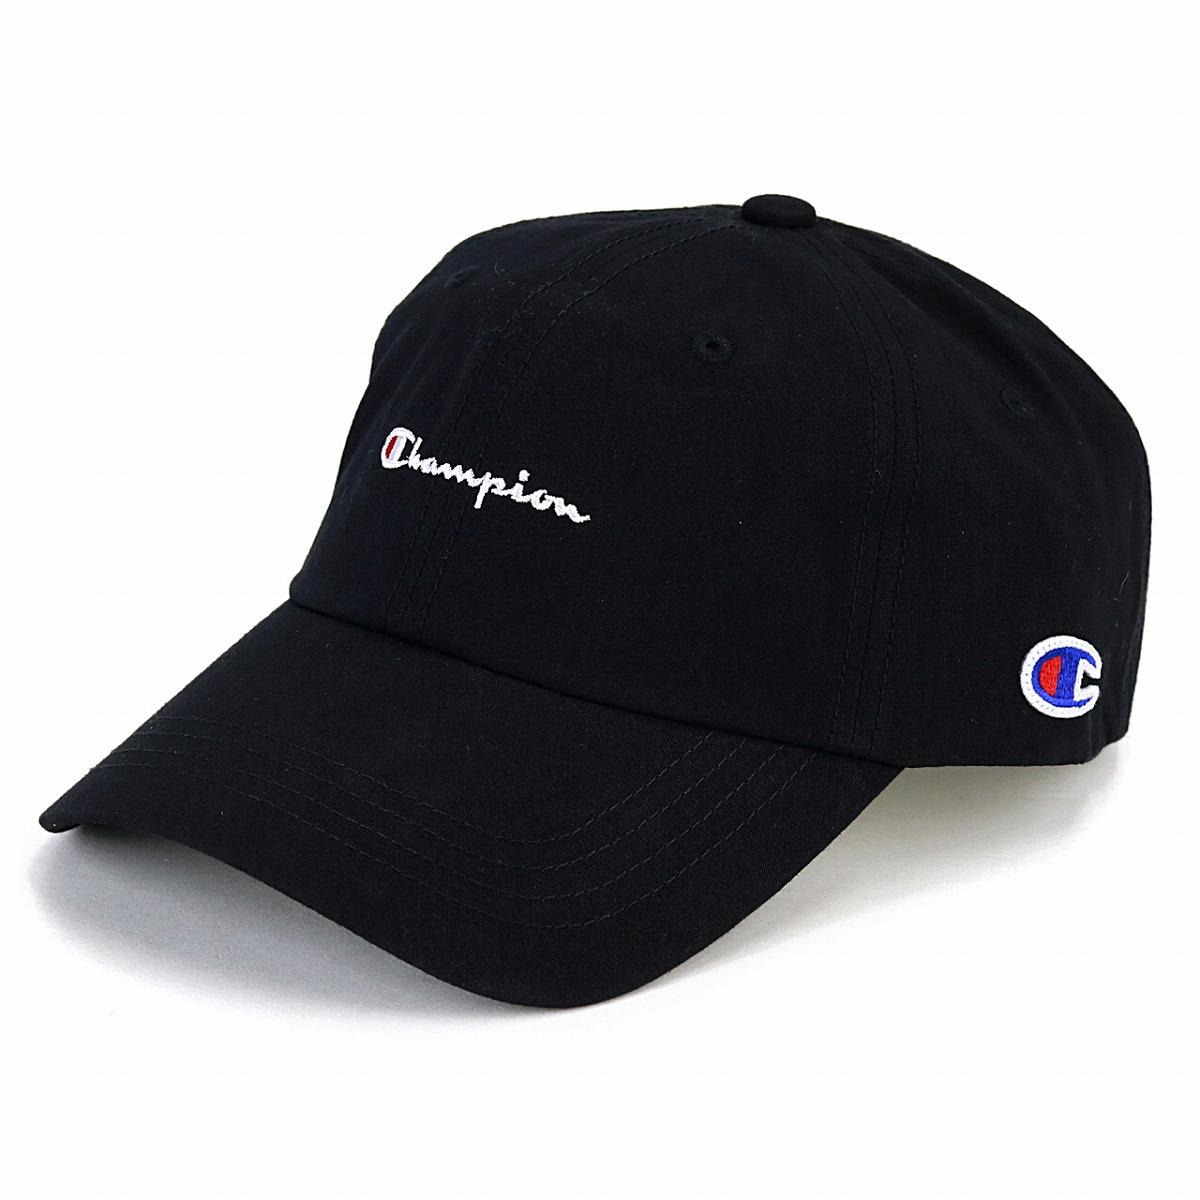 8ce60c676bcf56 Cap men champion logo cap champion low cap Lady's Shin pull plain casual  coordinates hat sports cap unisex adjustable size / dark blue navy [baseball  cap] ...